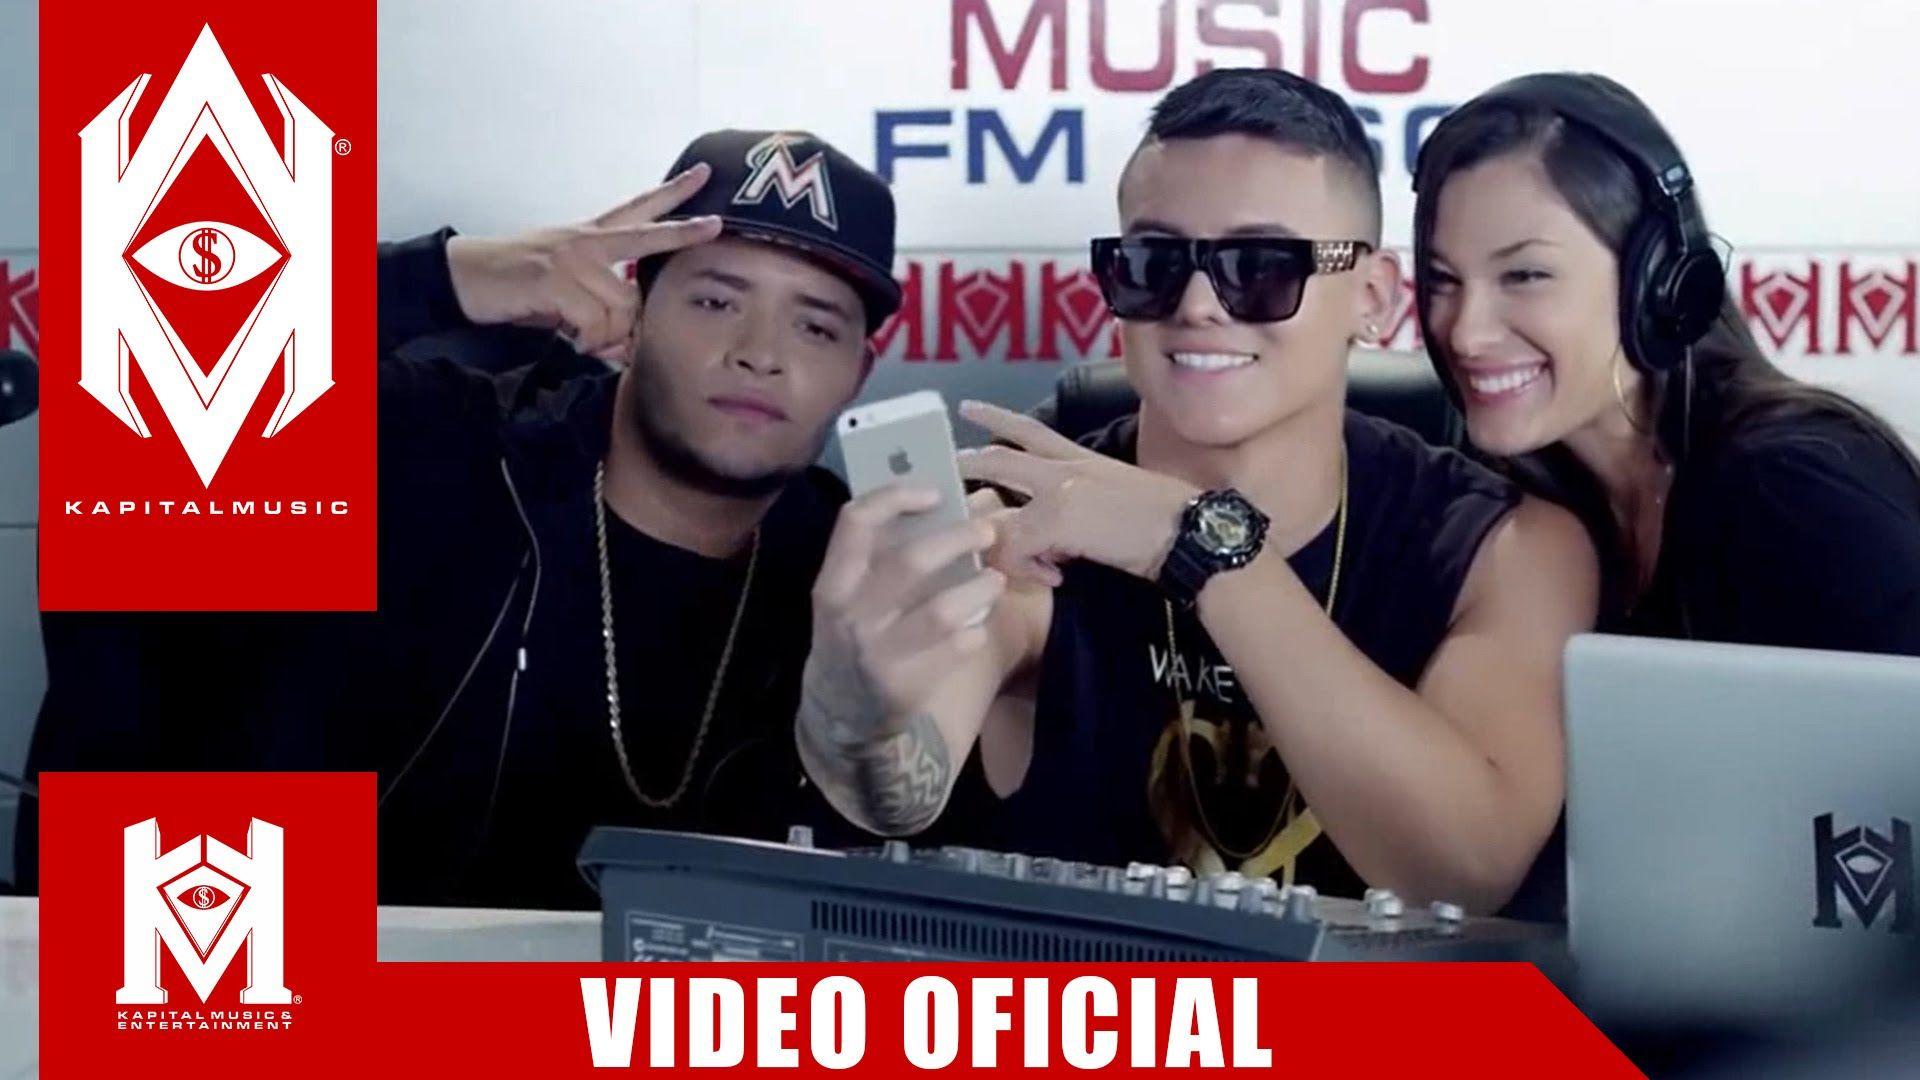 Kevin Roldan Ft Ronald El Killa Quien Te Va Amar Como Yo Video Oficial Youtube Canciones Oficial